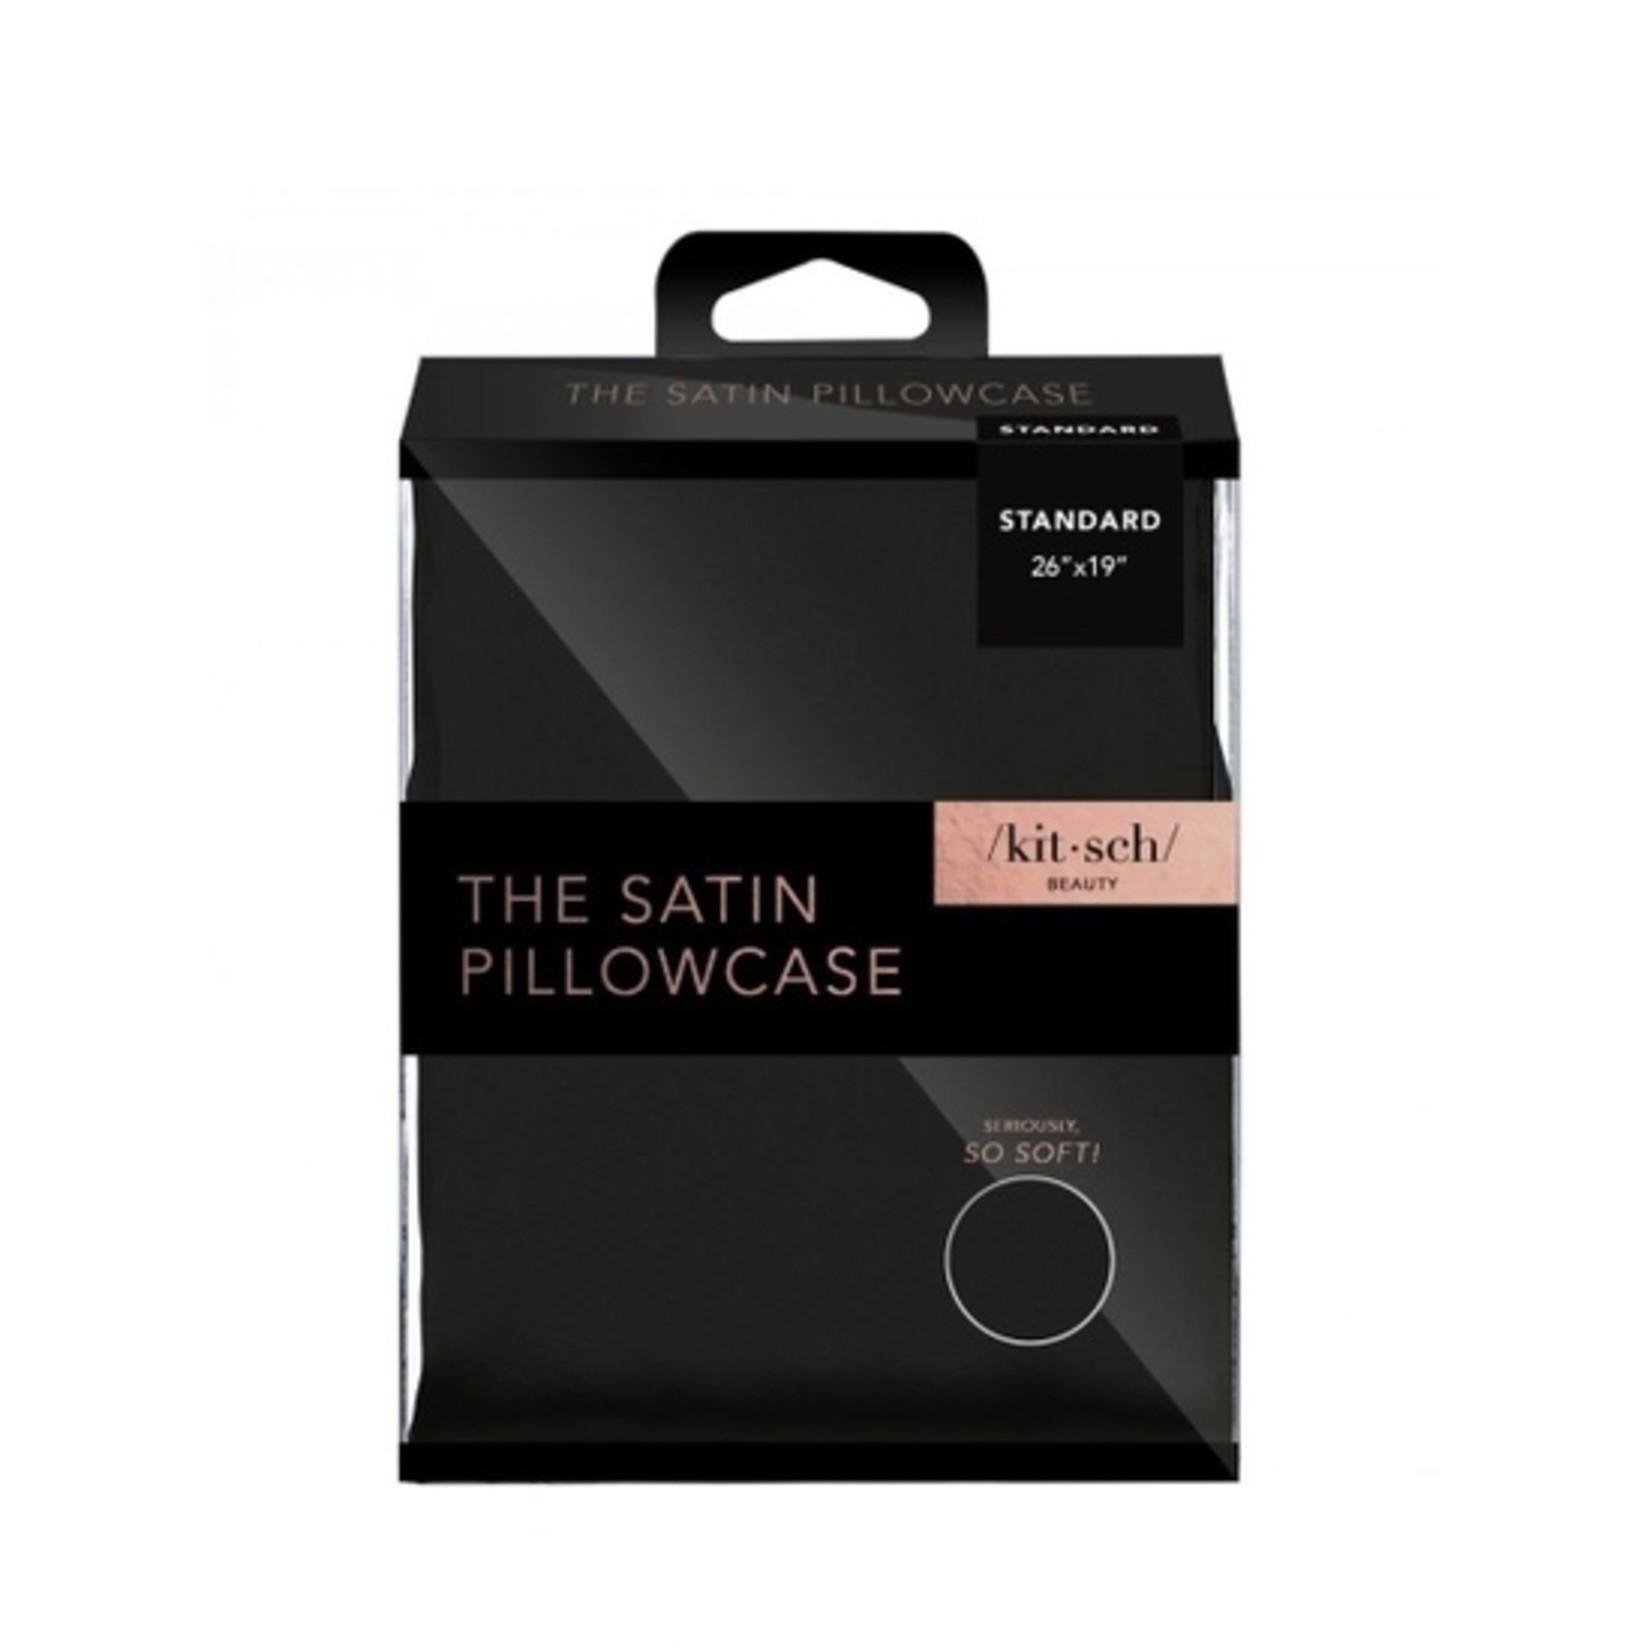 Kitsch Black Satin Pillowcase